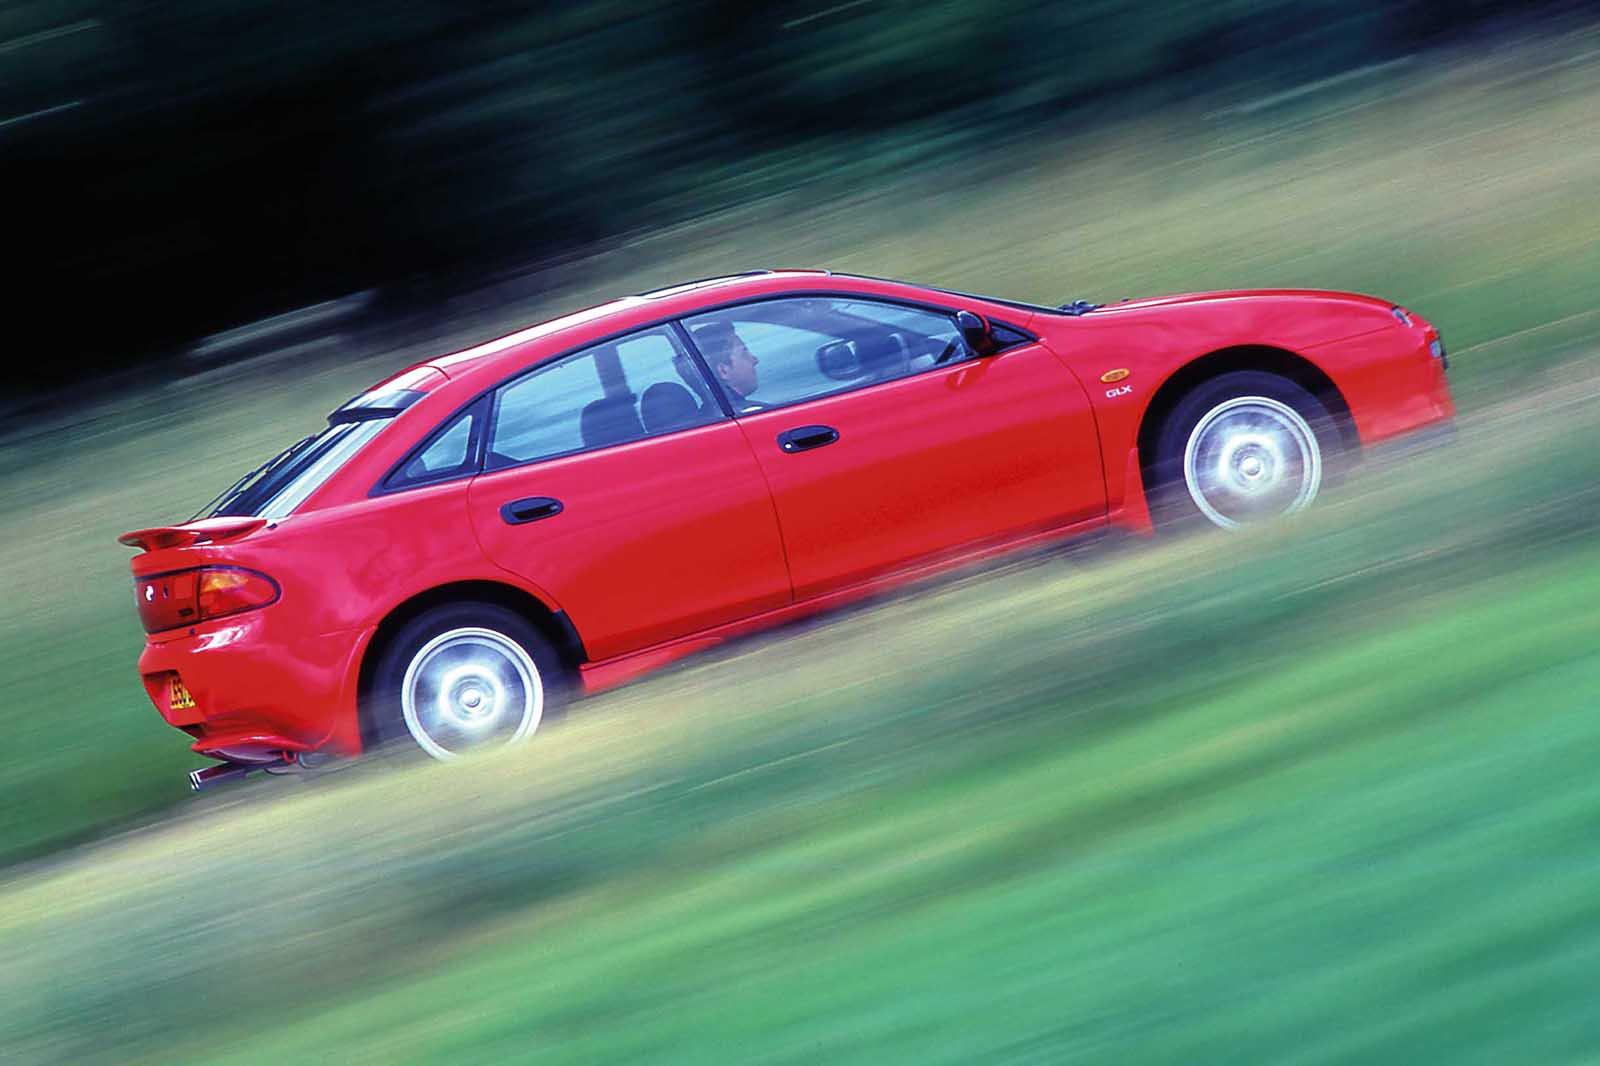 Mazda 323 side shot